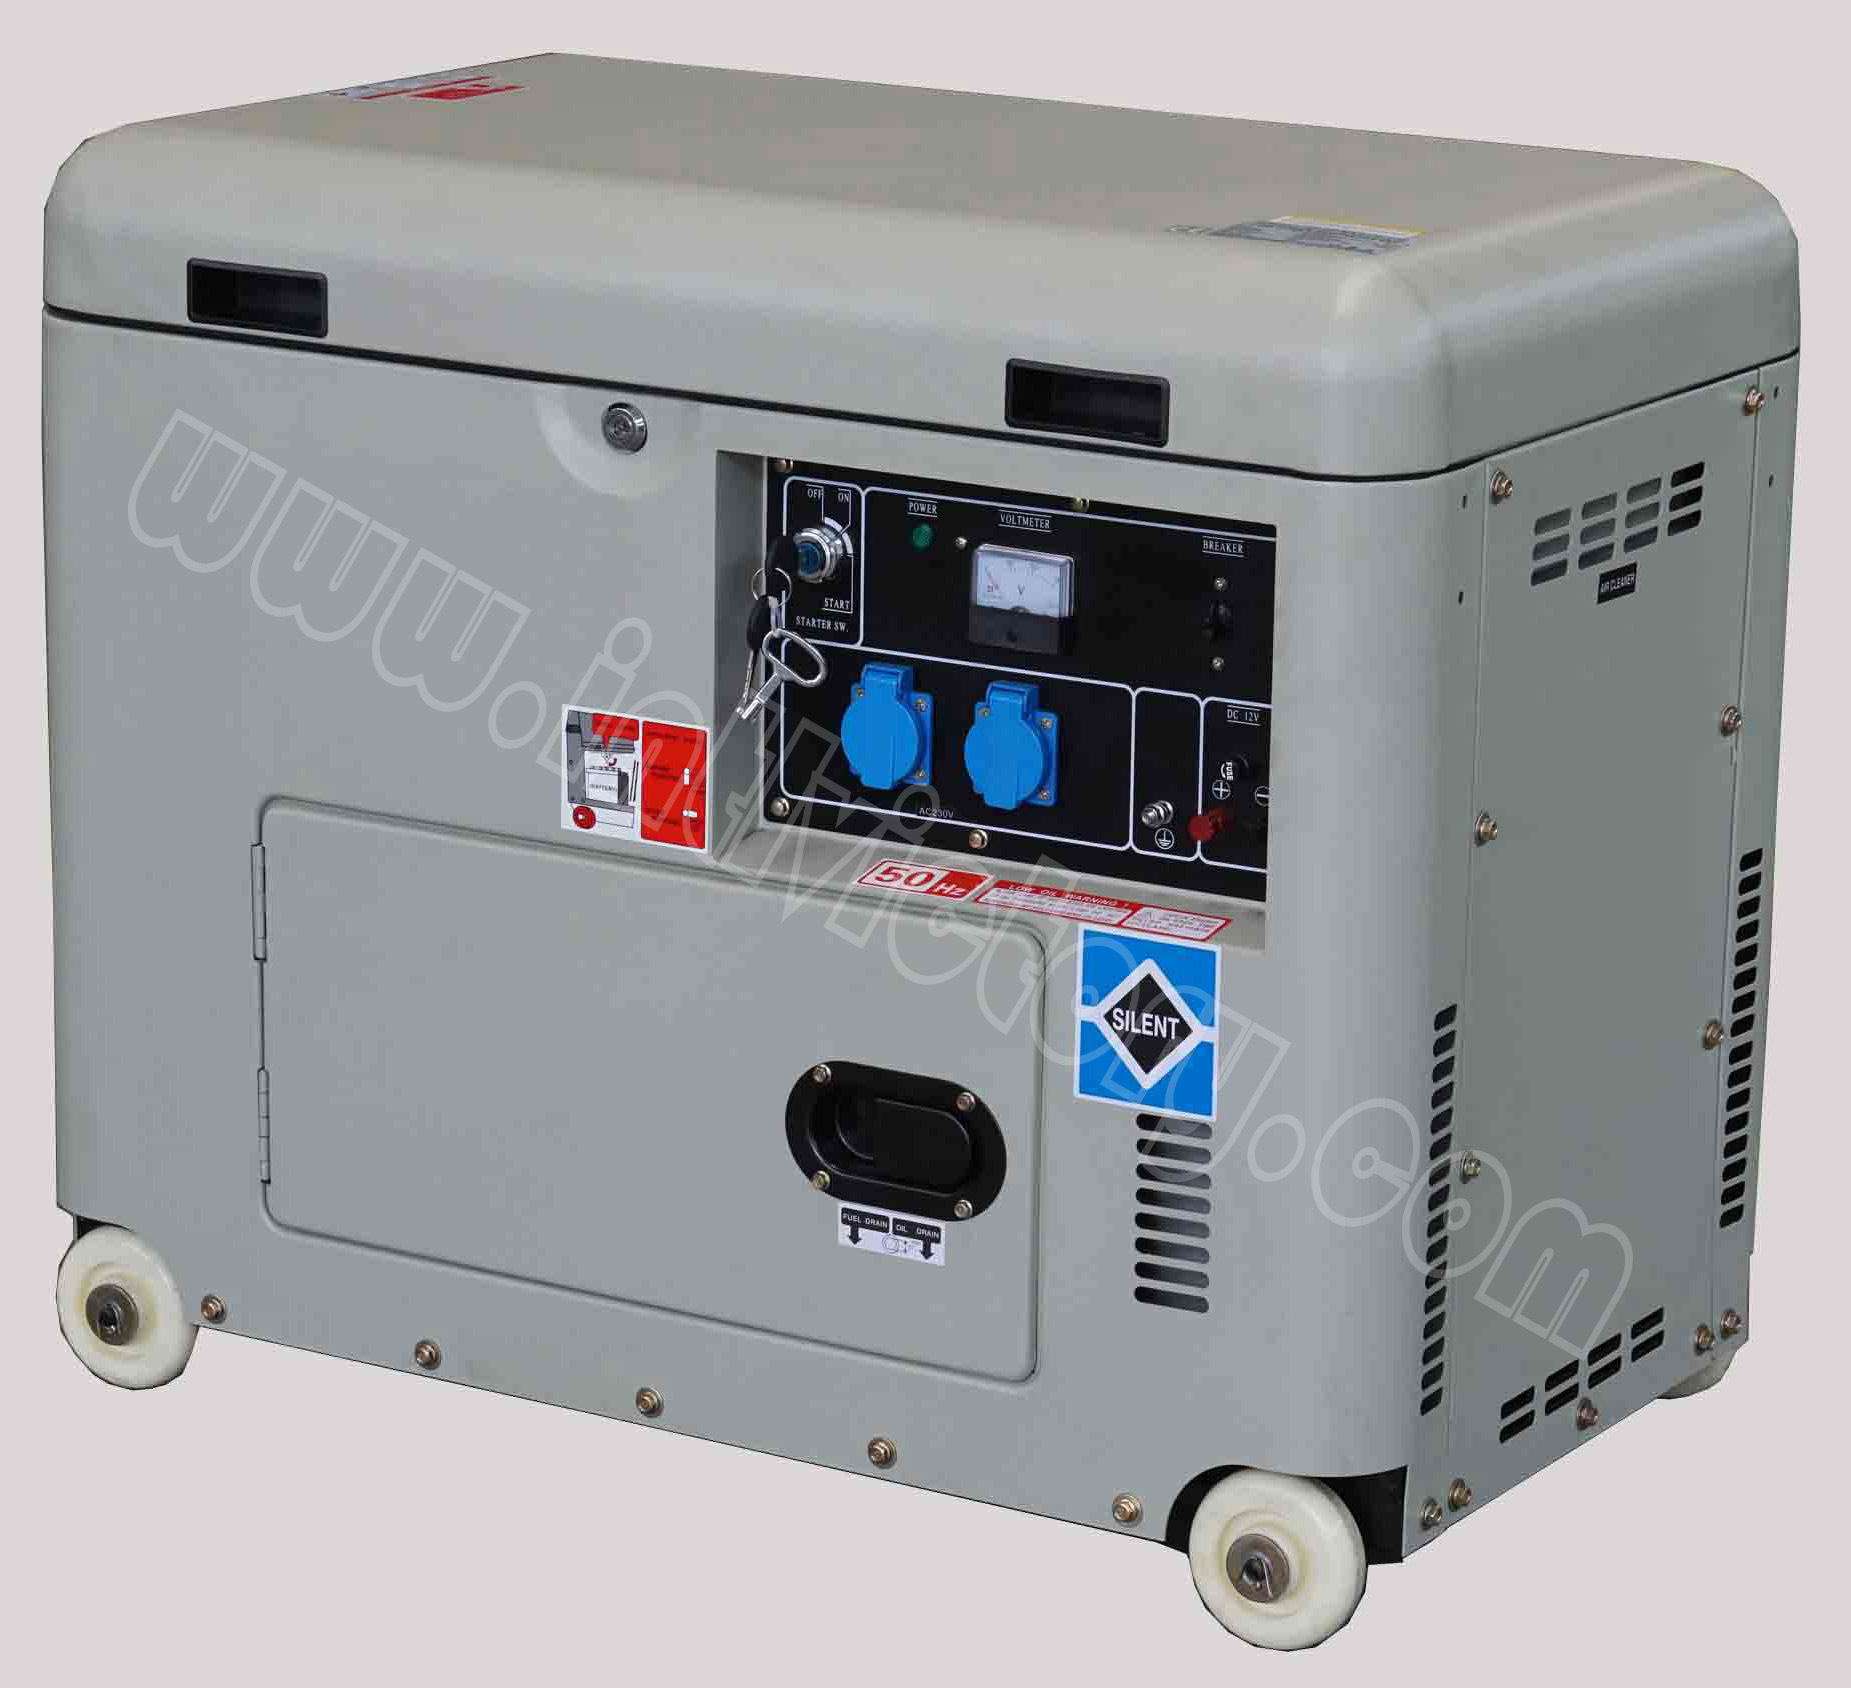 4kVA~6kVA Diesel Soundproof Genset with CE/Soncap/Ciq Certificate